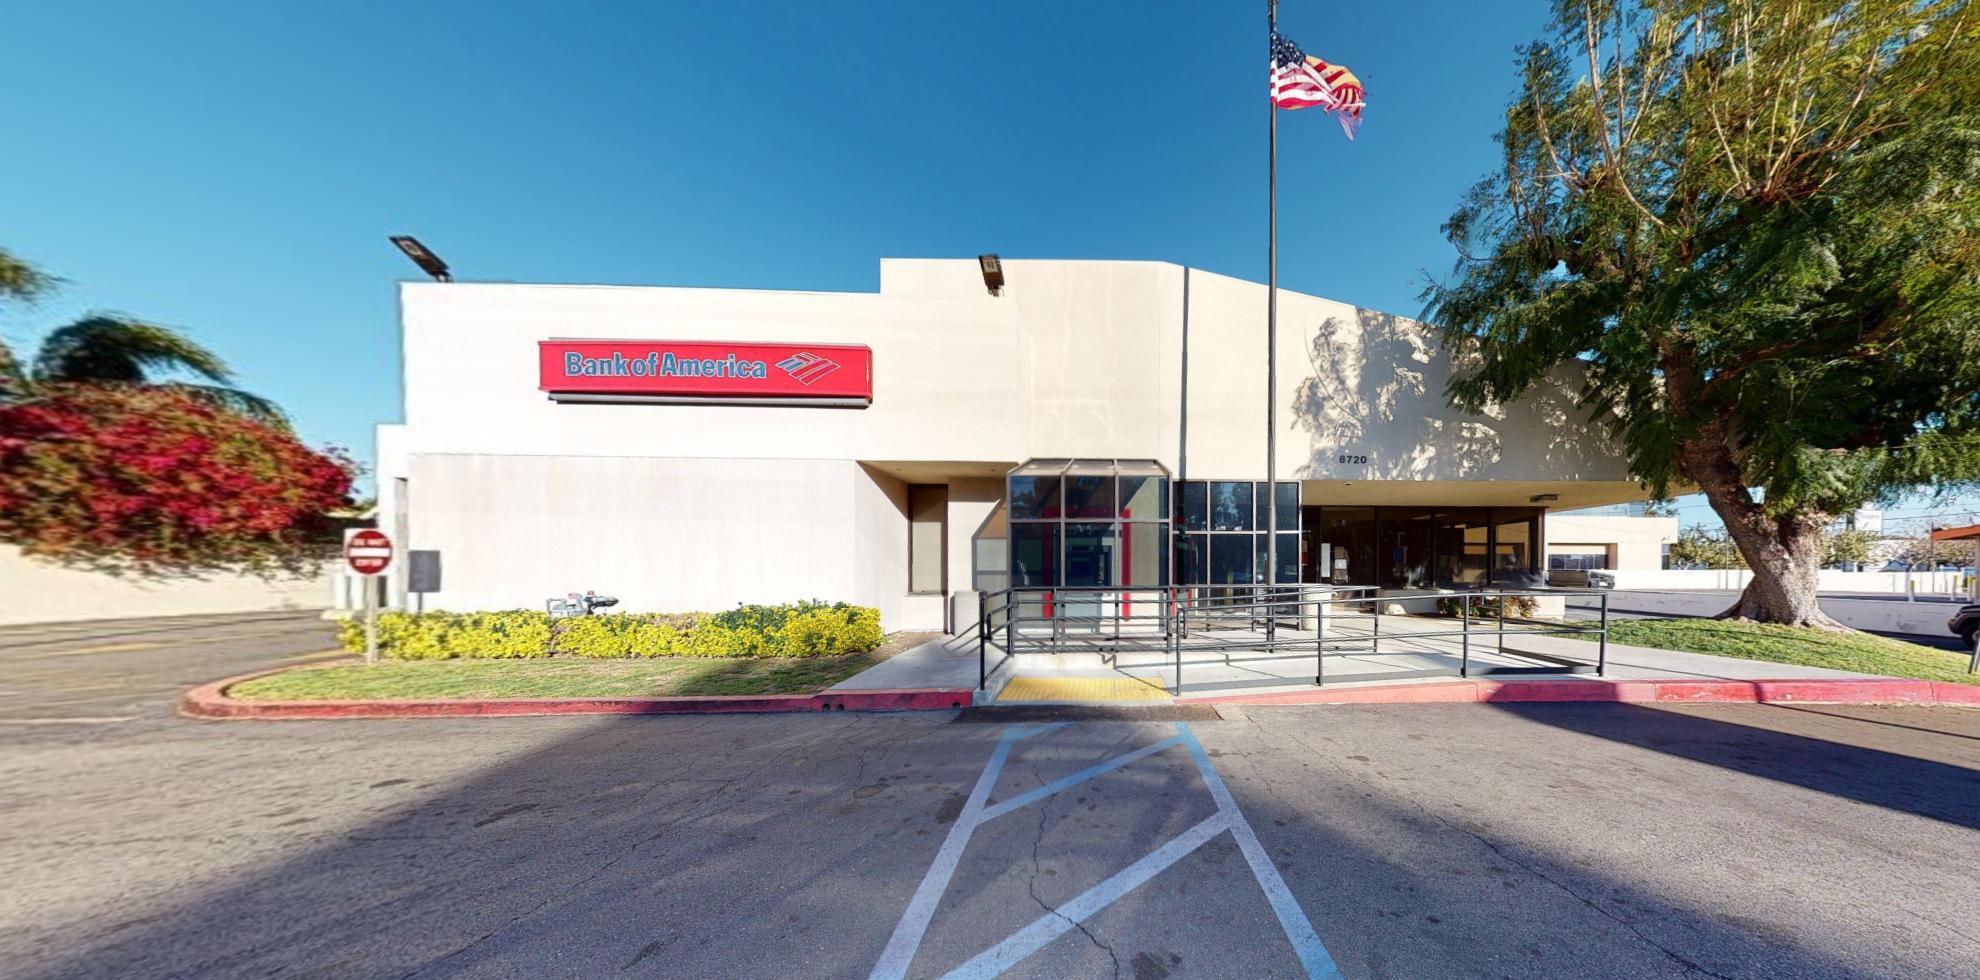 Bank of America financial center with drive-thru ATM   8720 Balboa Blvd, Northridge, CA 91325